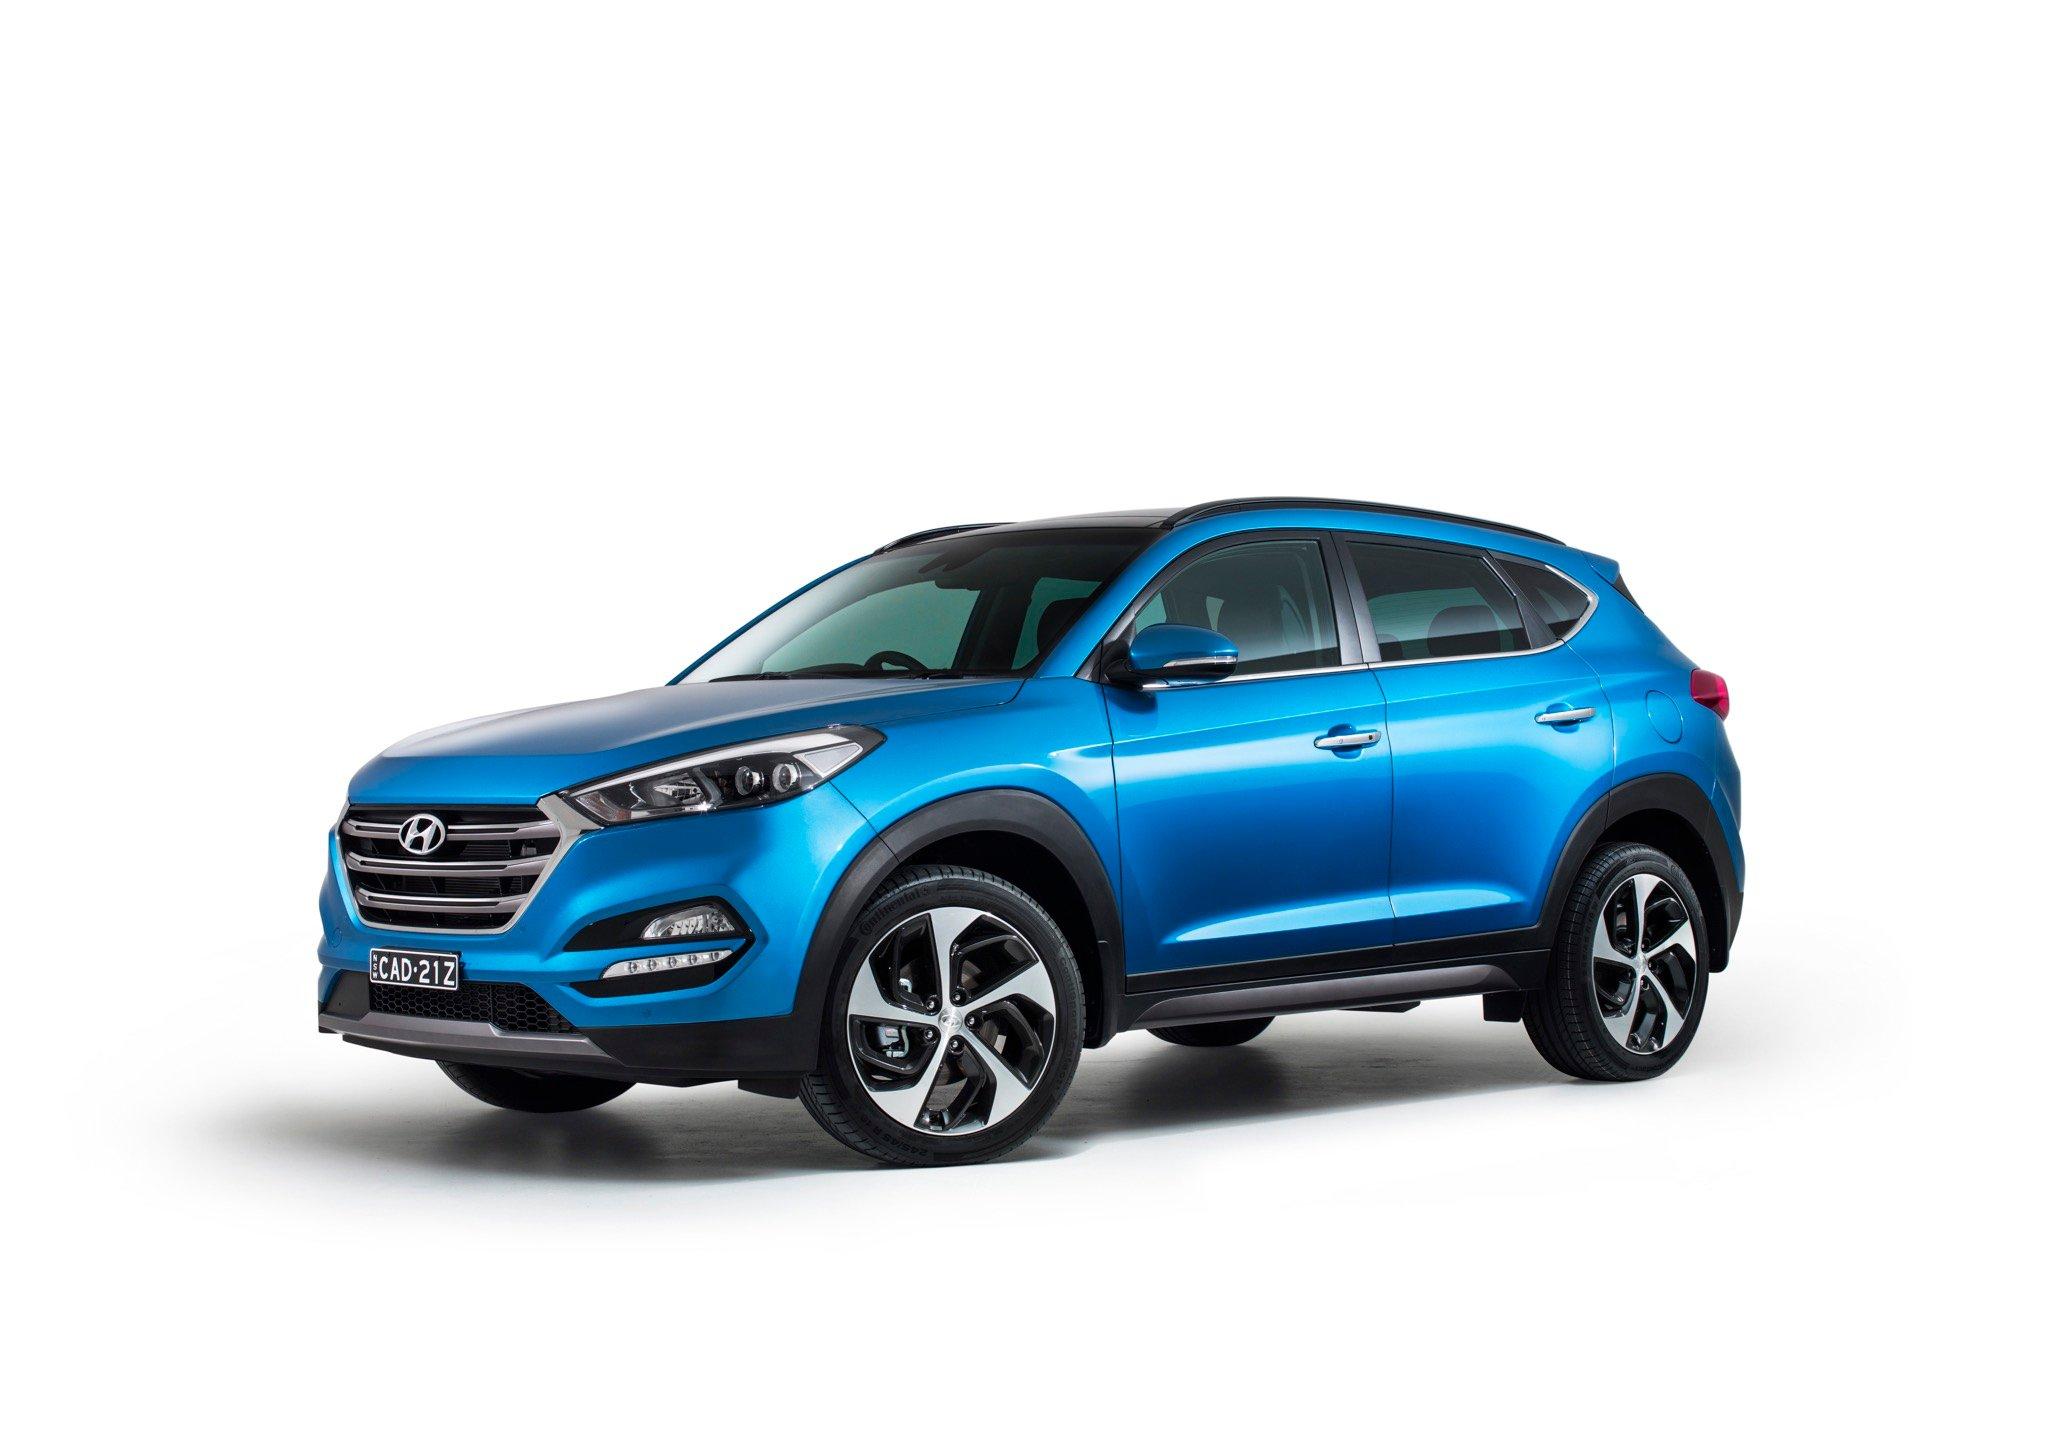 2016 Hyundai Tucson Review - photos | CarAdvice